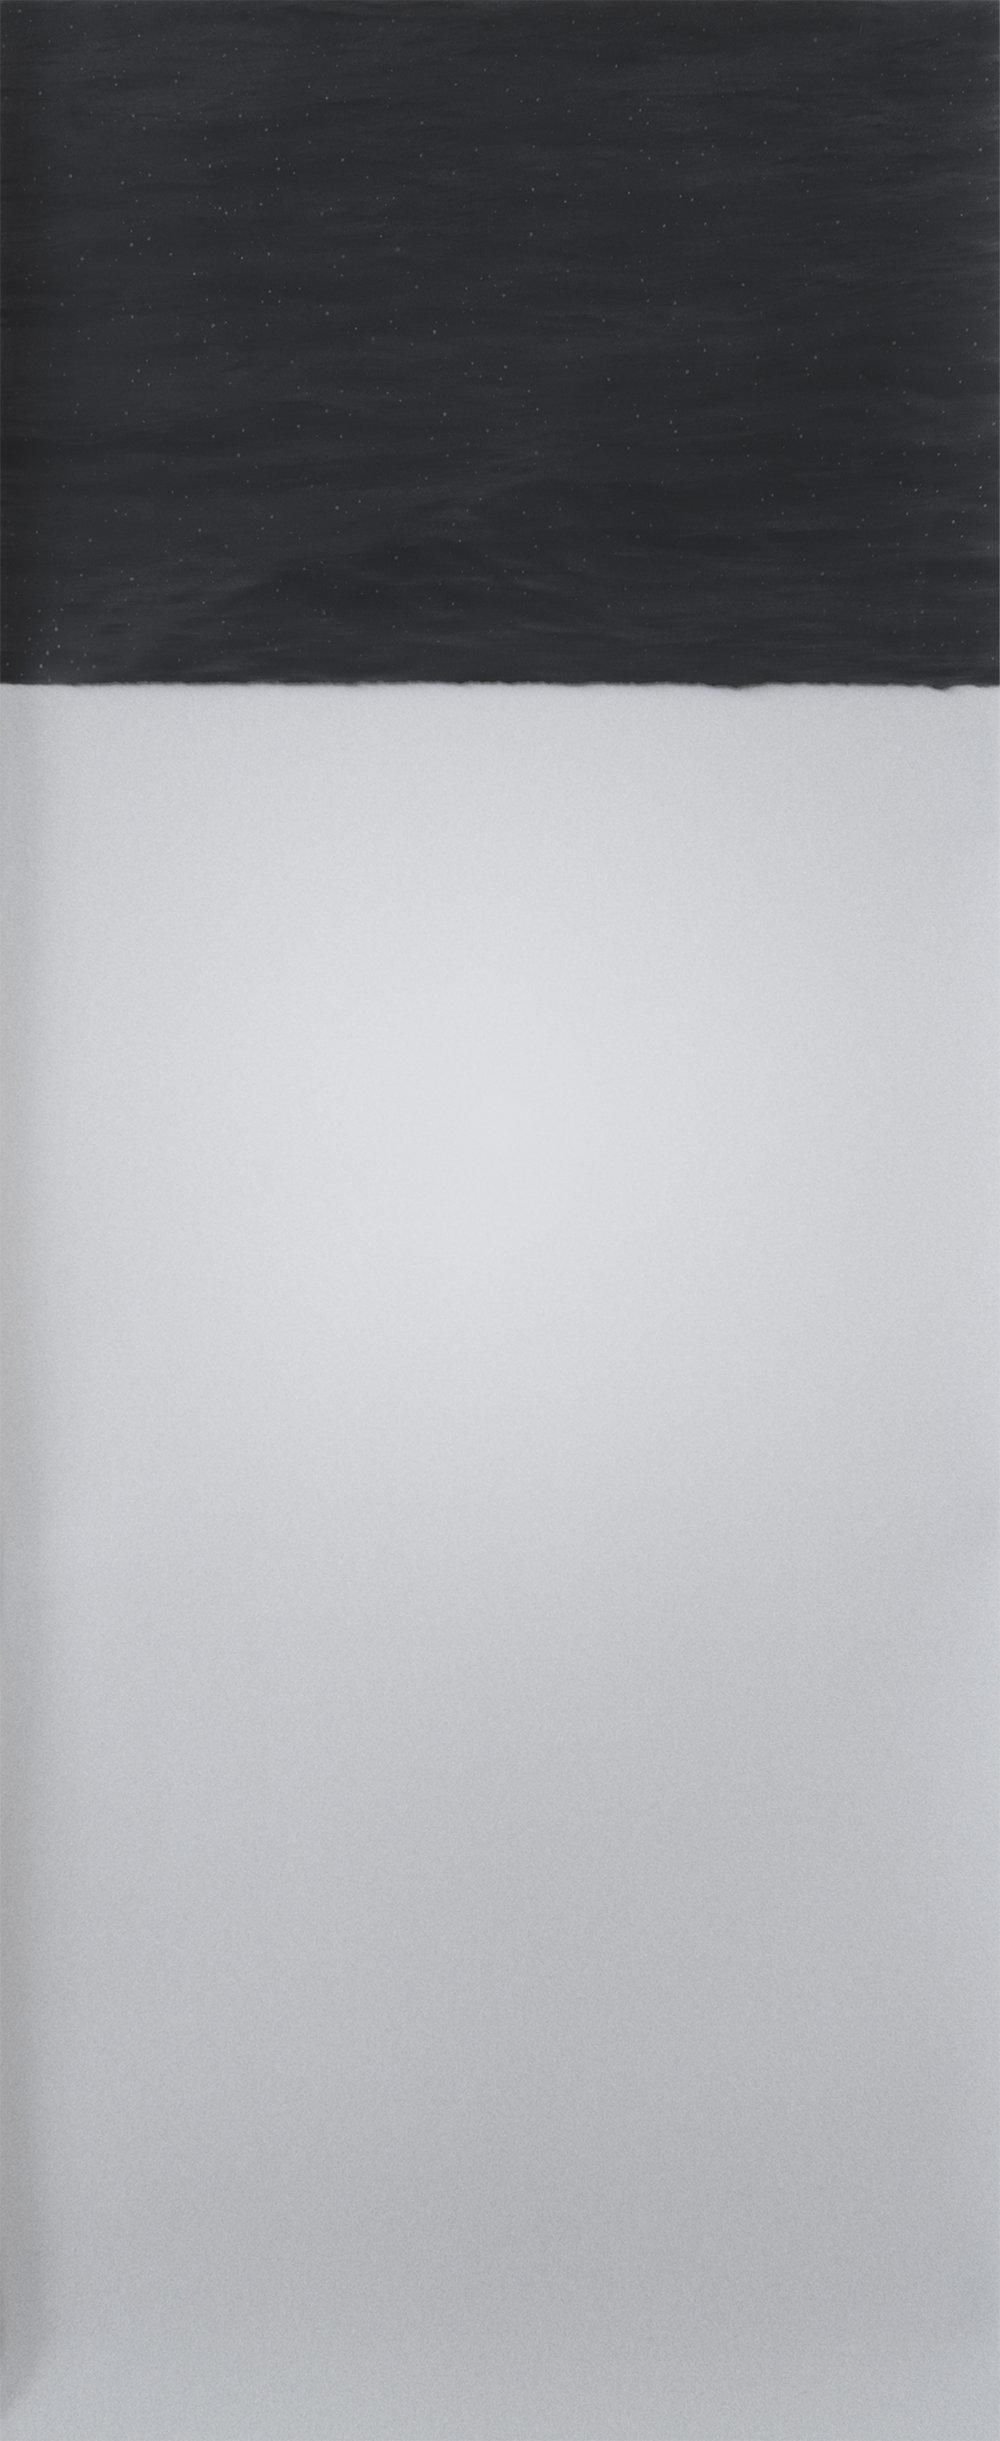 "Day/Night, 2017 Archival Pigment Print/Graphite, 18"" x 45"" $2,500"